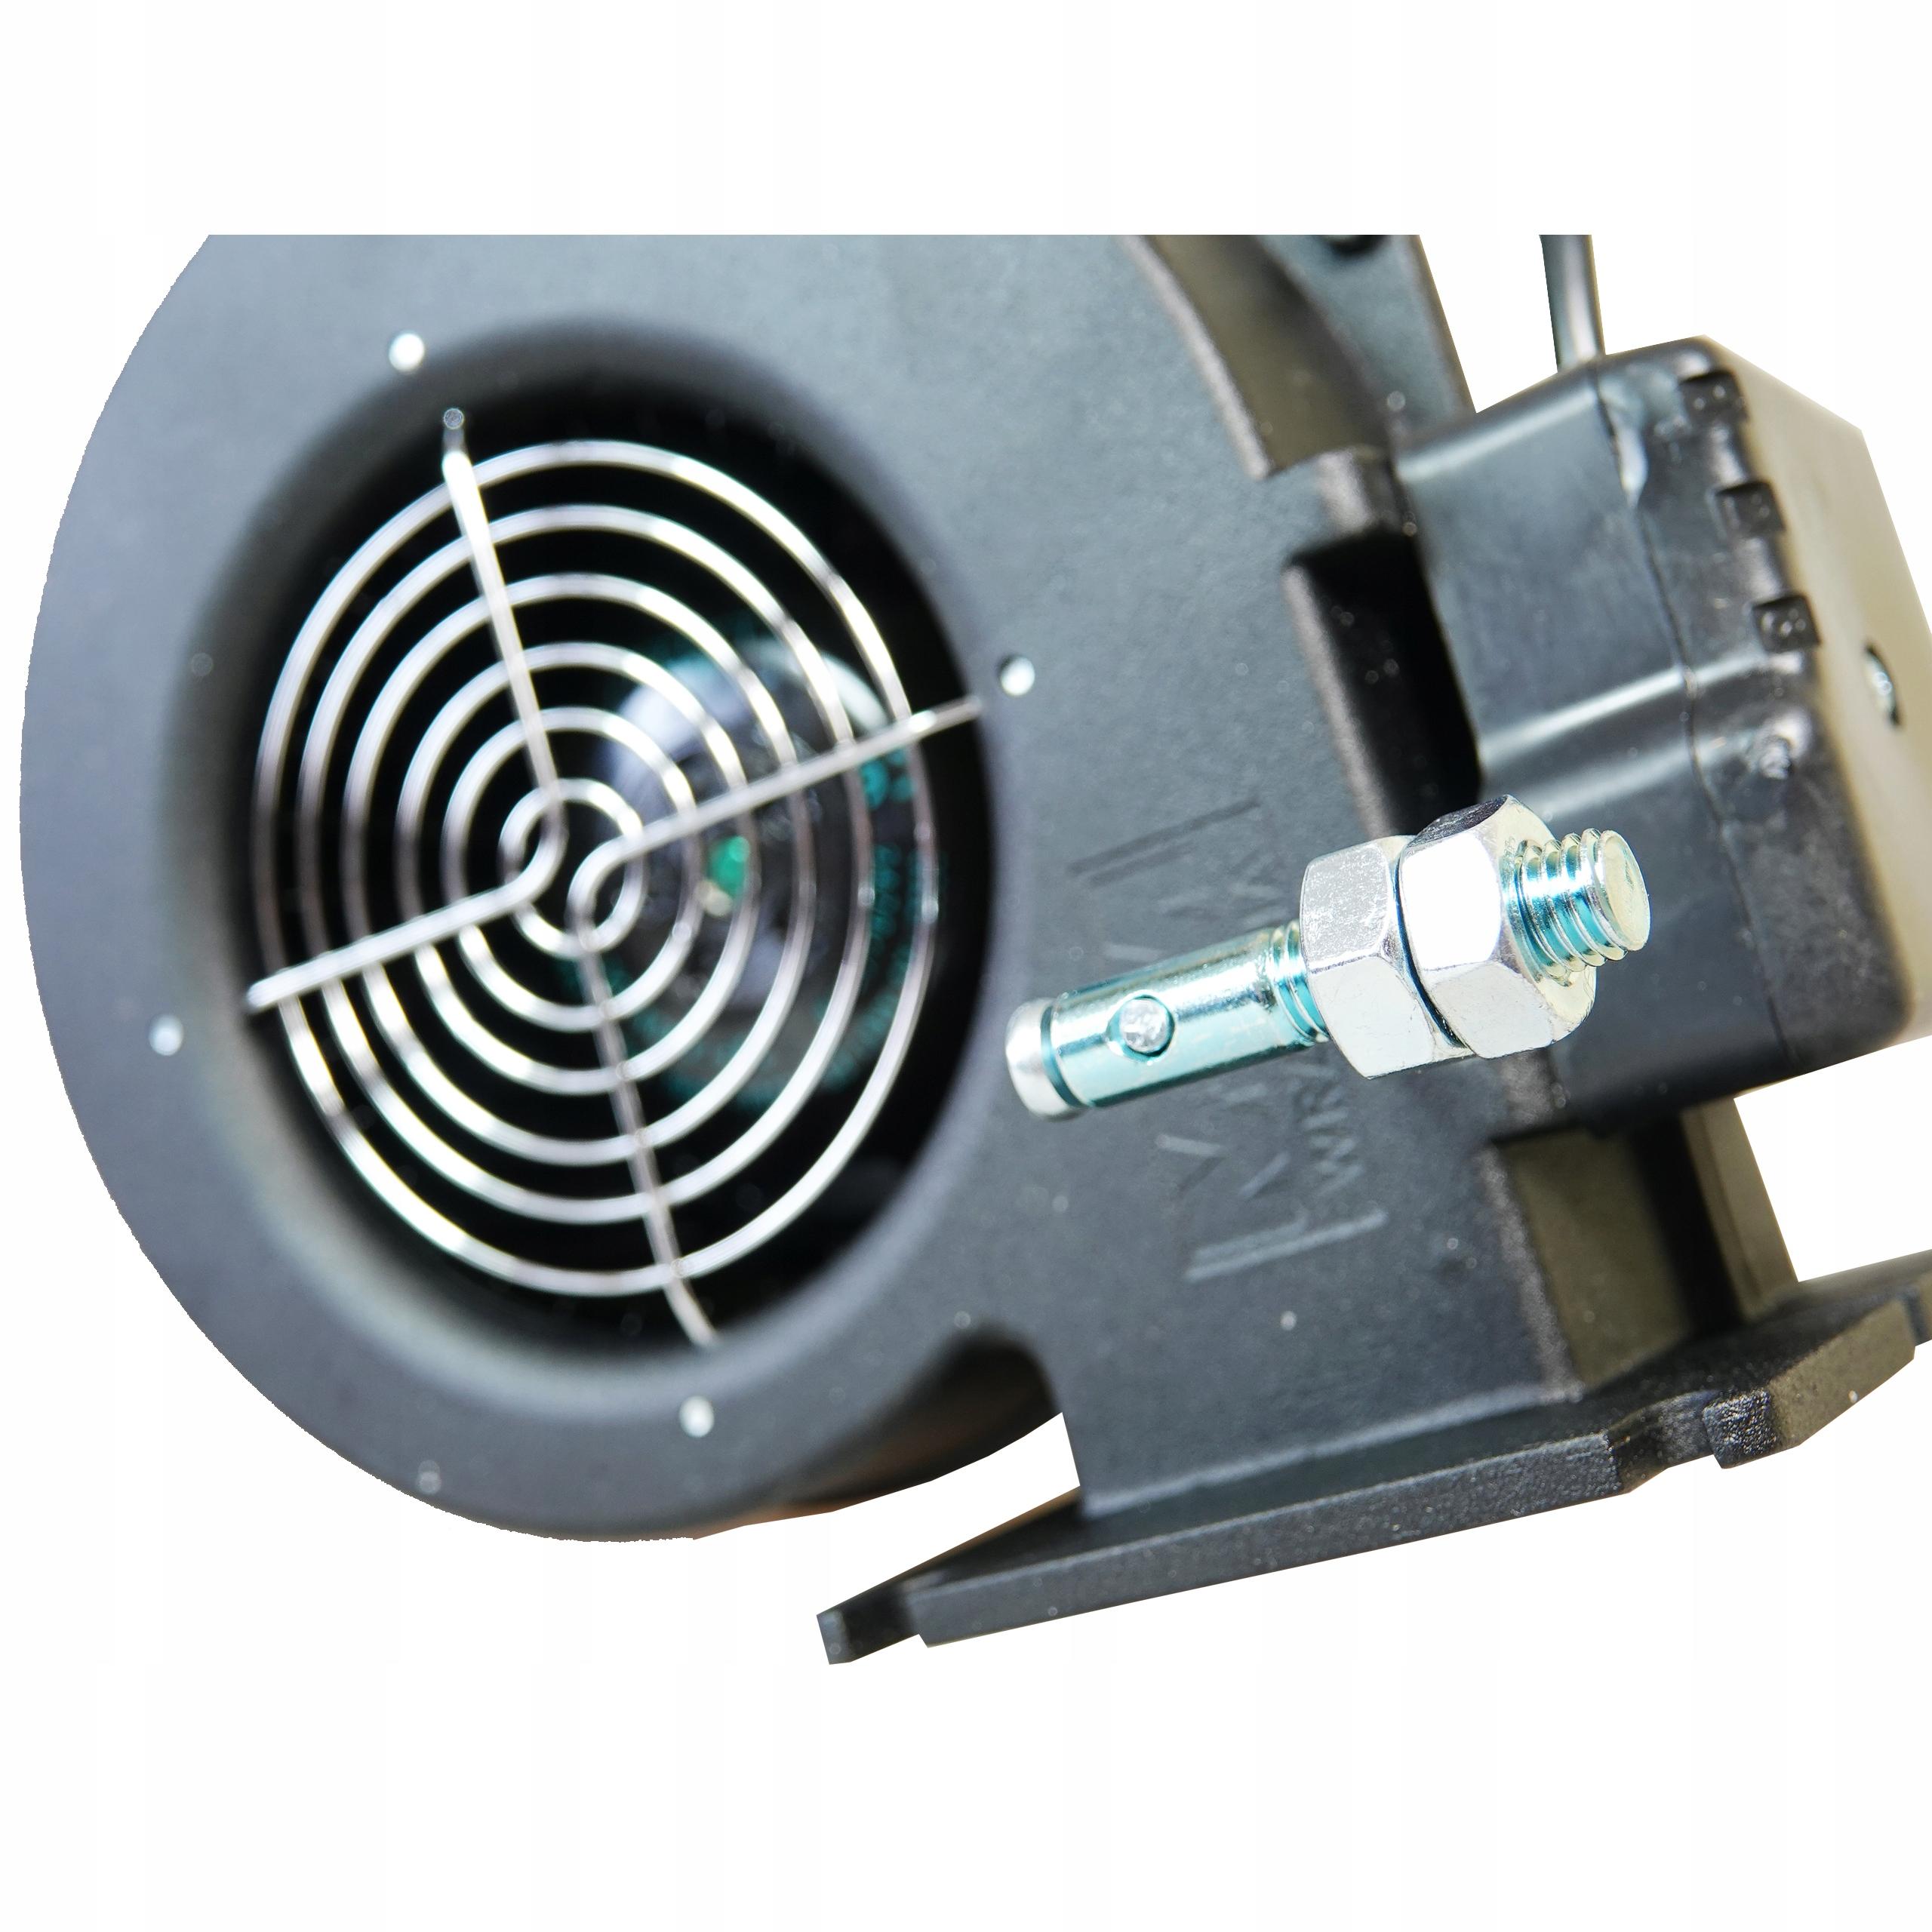 Dúchadlo WPA x2 ventilátor kotlovej pece WPA 120 67W EAN 2001230122904